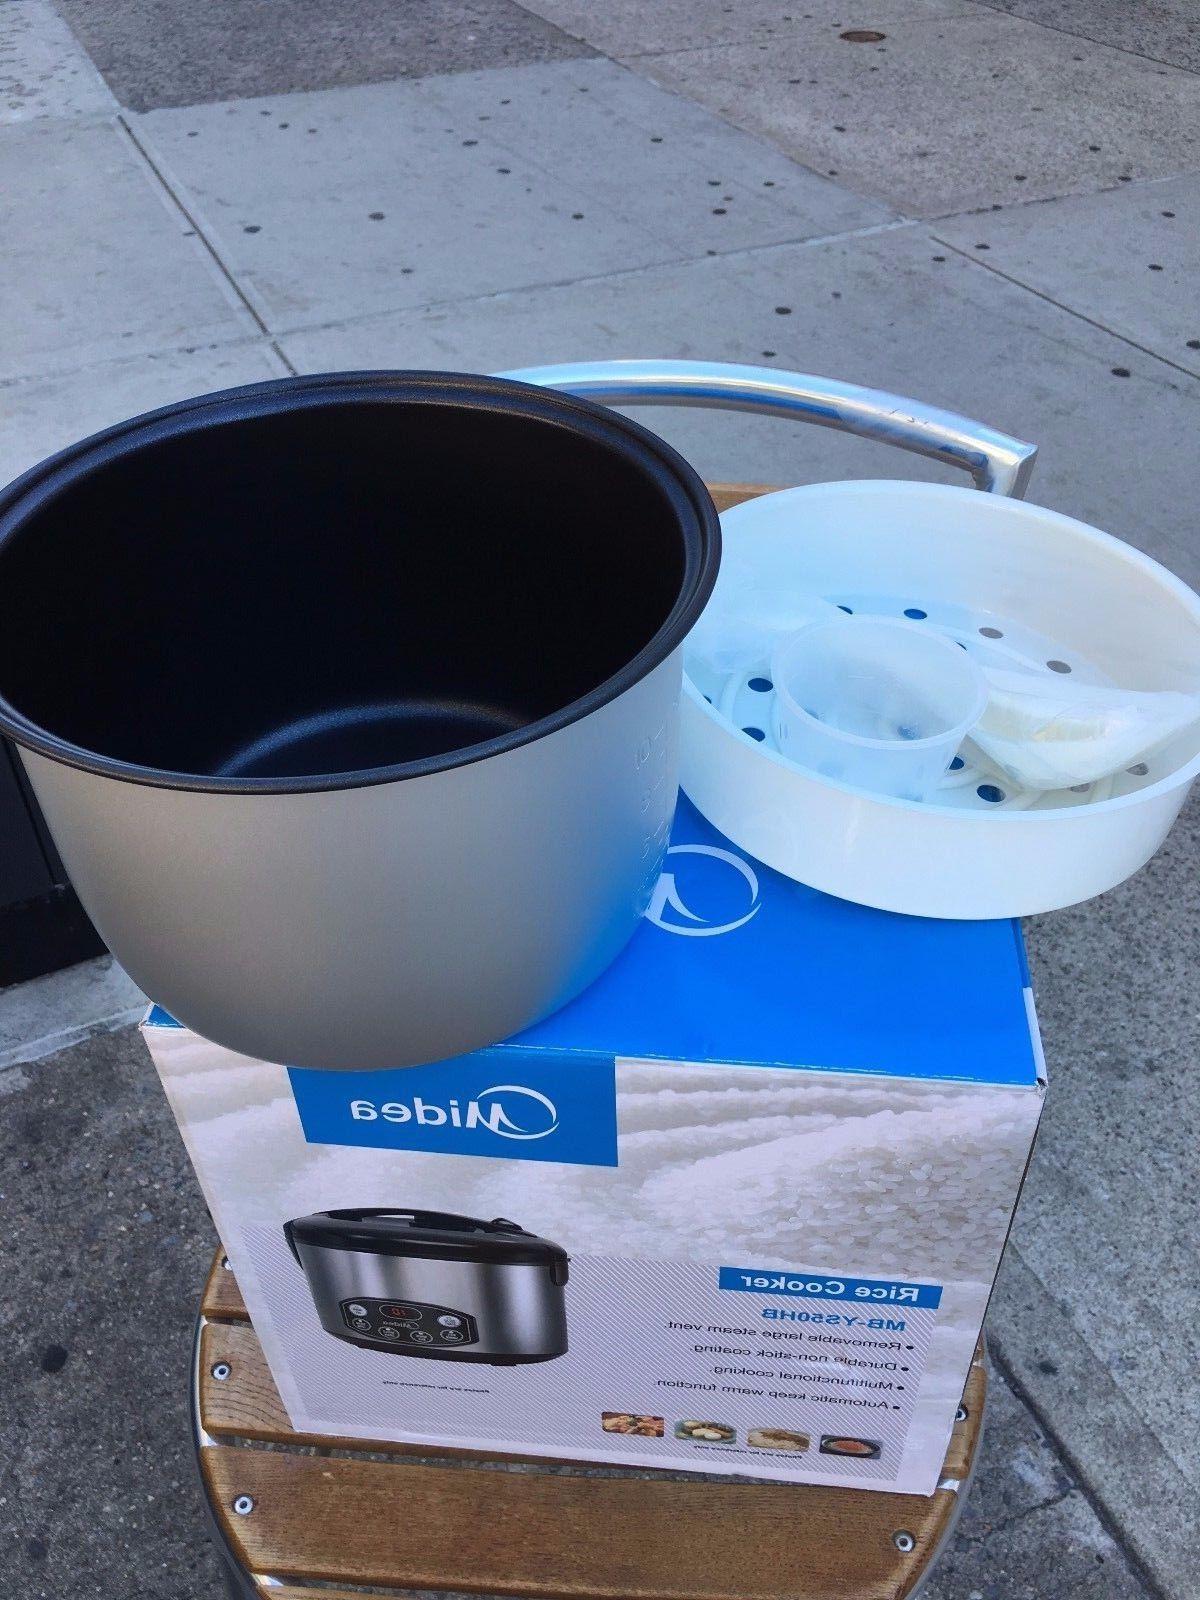 Midea Multifunction Digital steel Rice 10 Cups